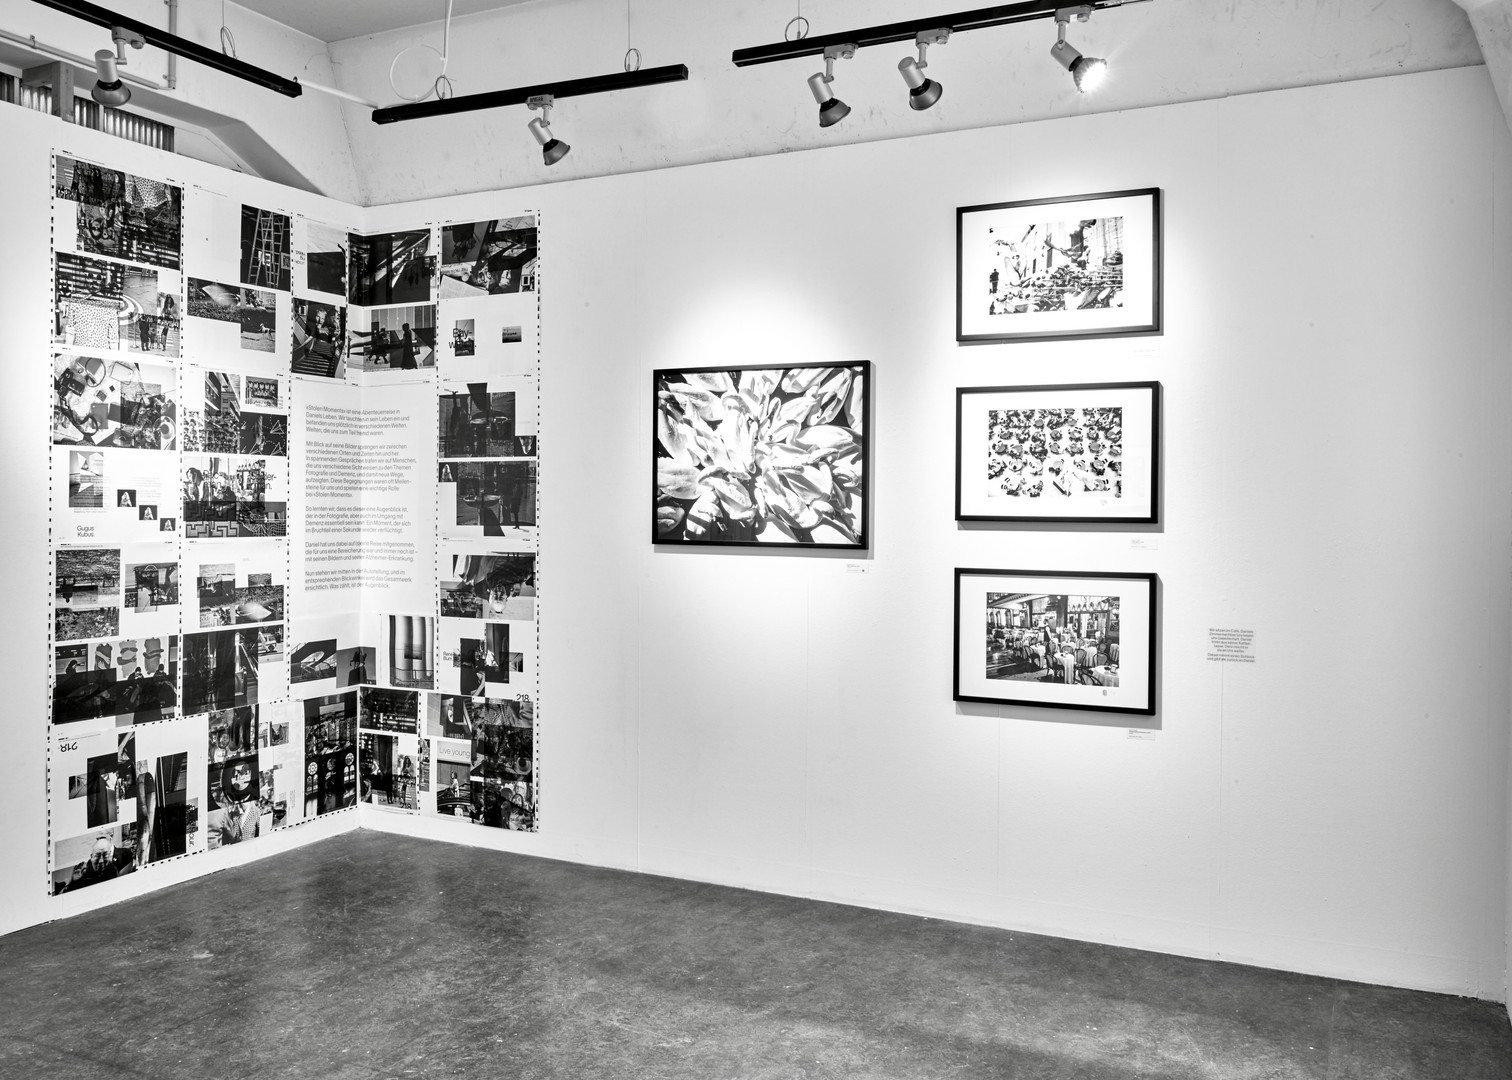 007_Ausstellung_11.jpg